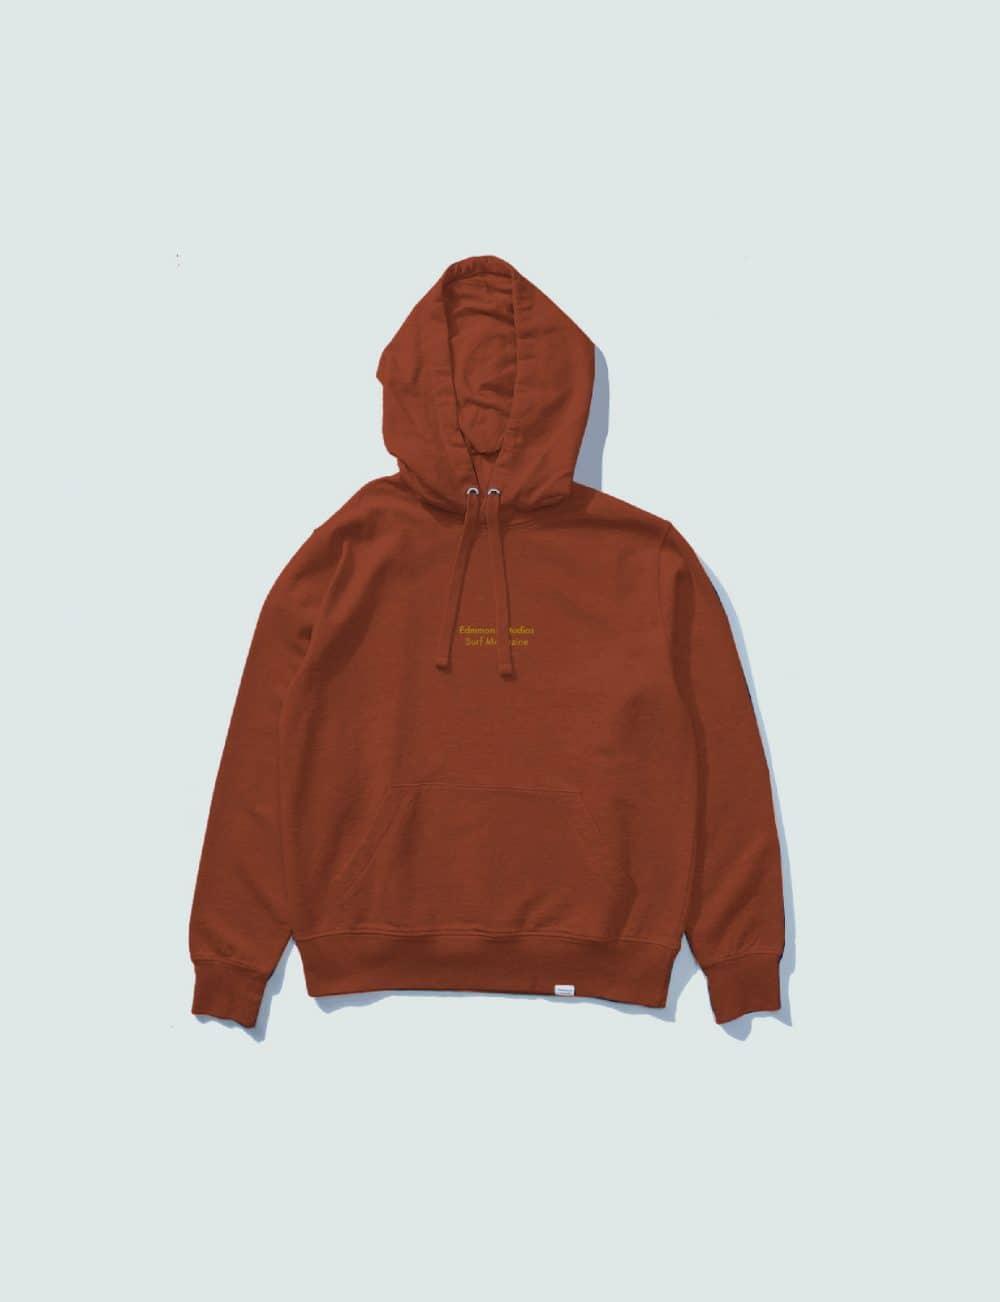 Castart - Edmmond ESSM hoodie - Rust